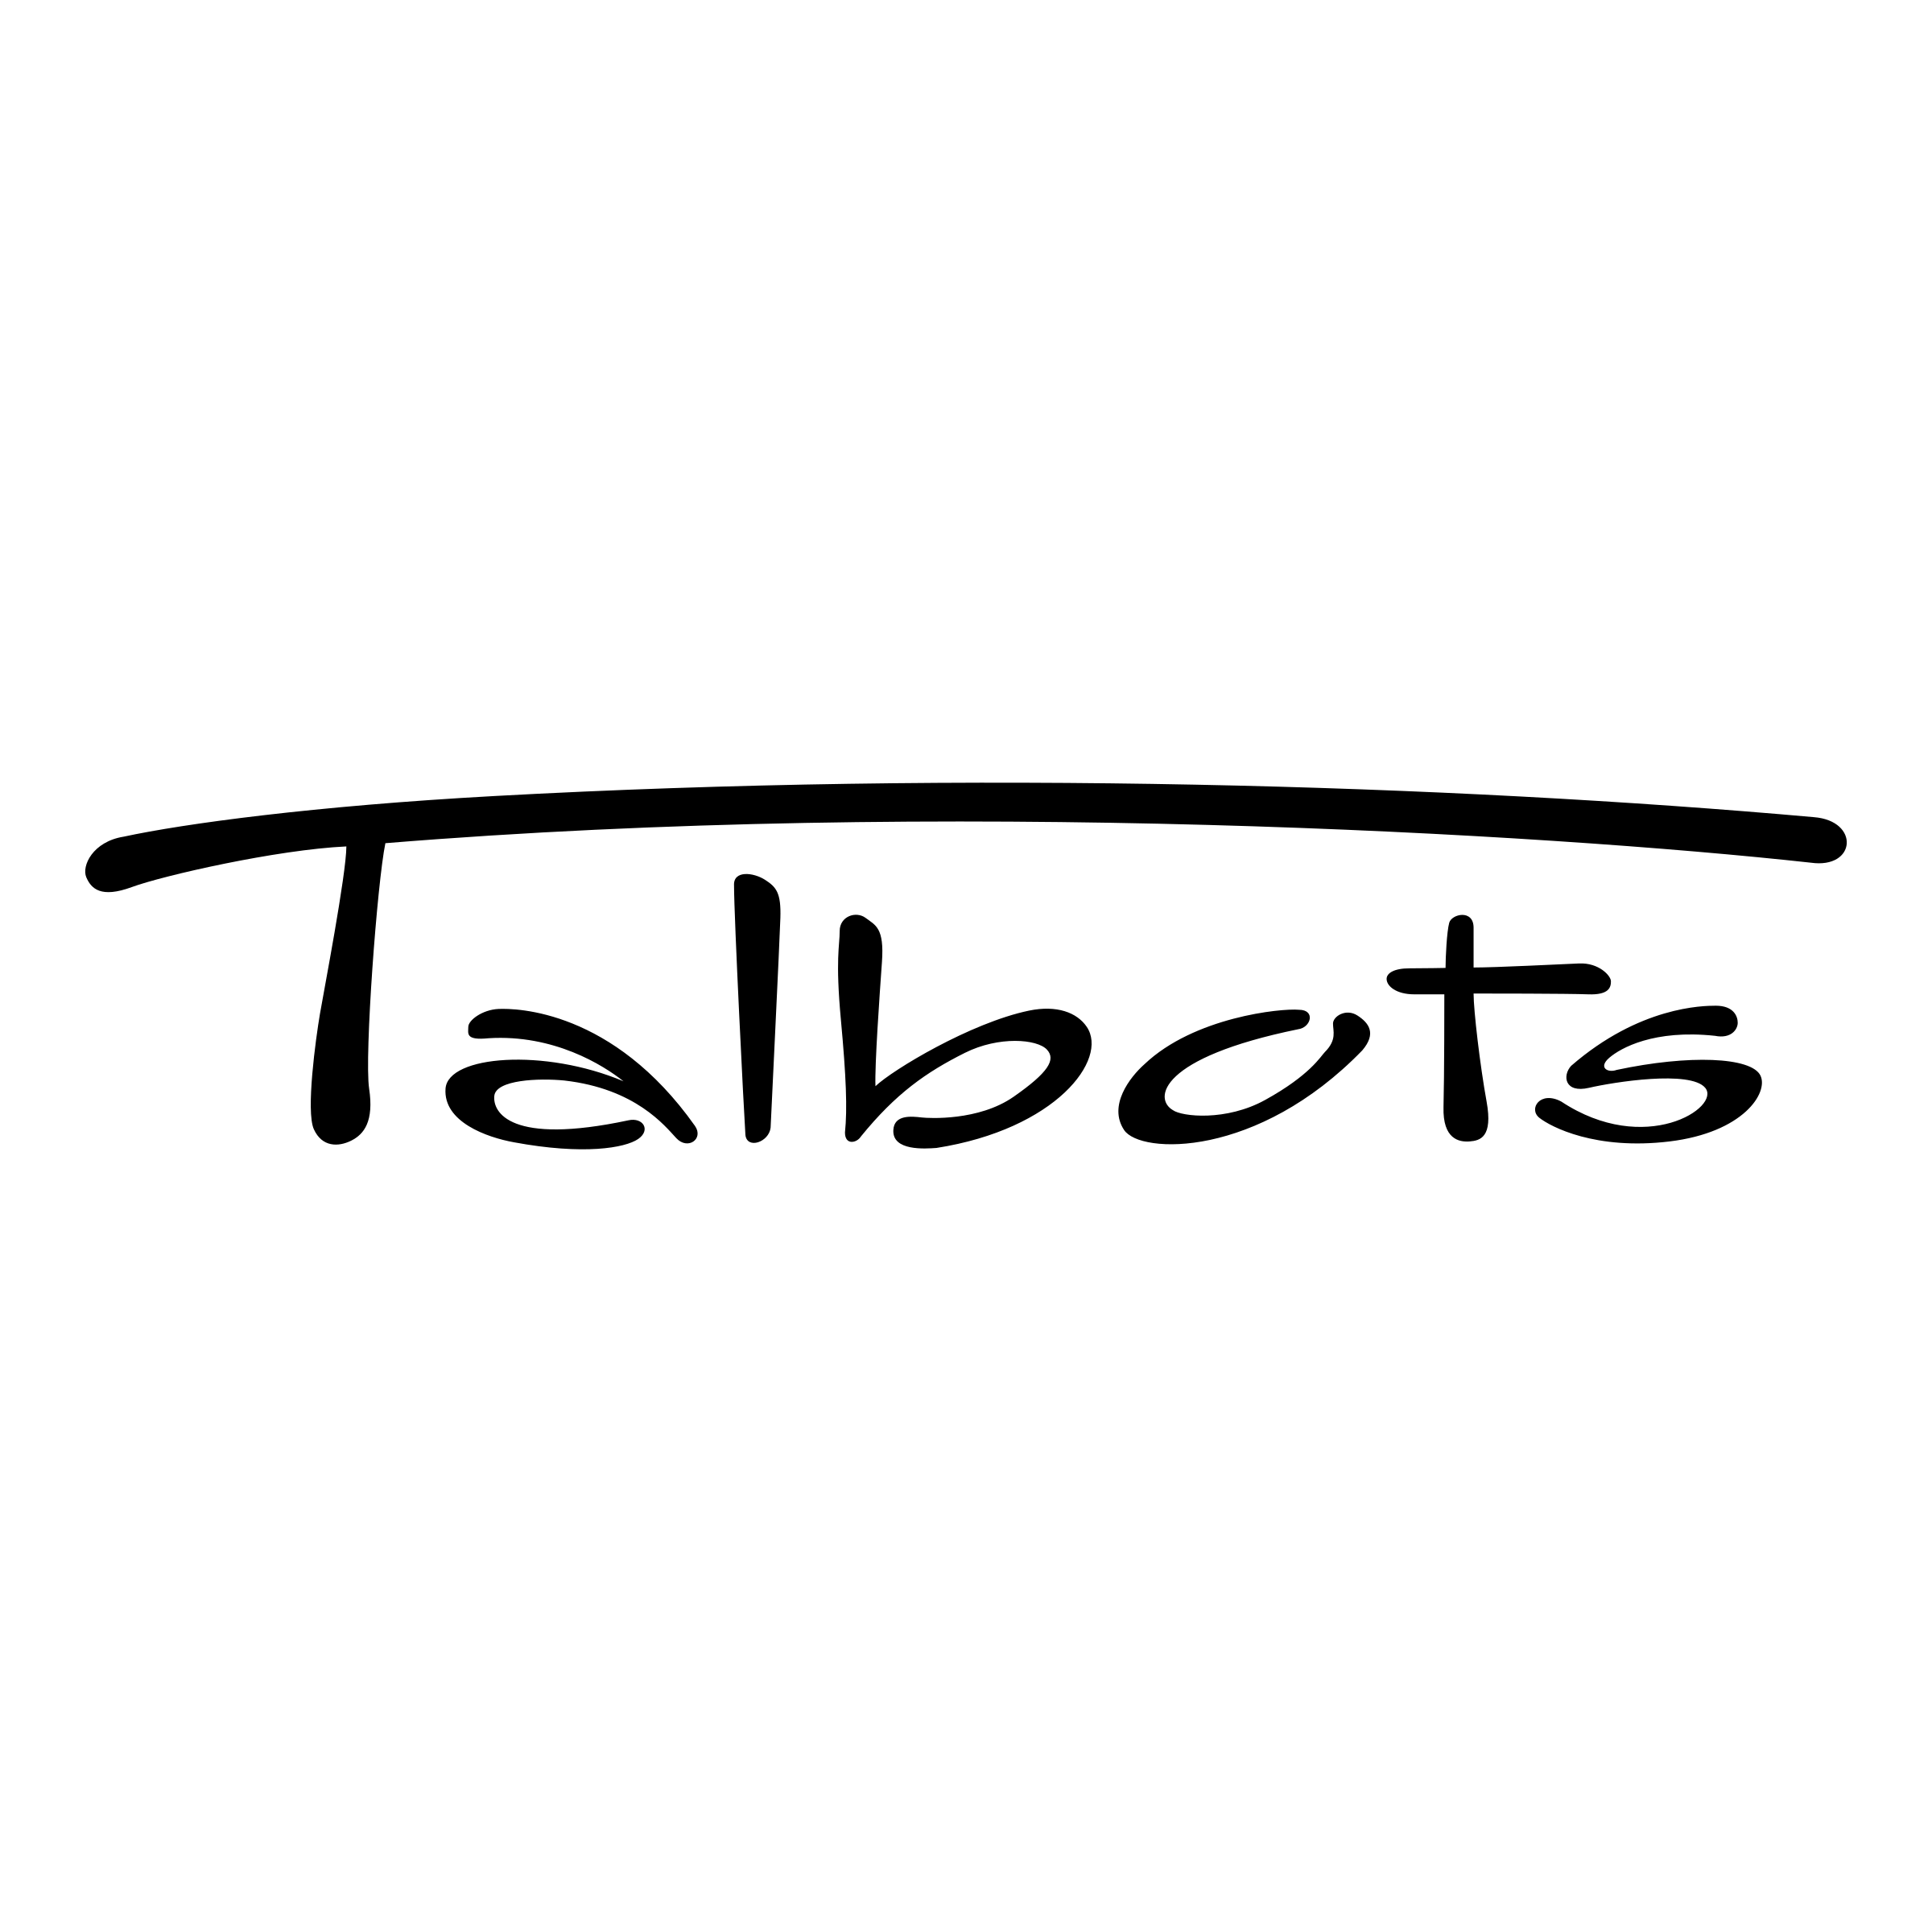 talbots-1-logo-png-transparent